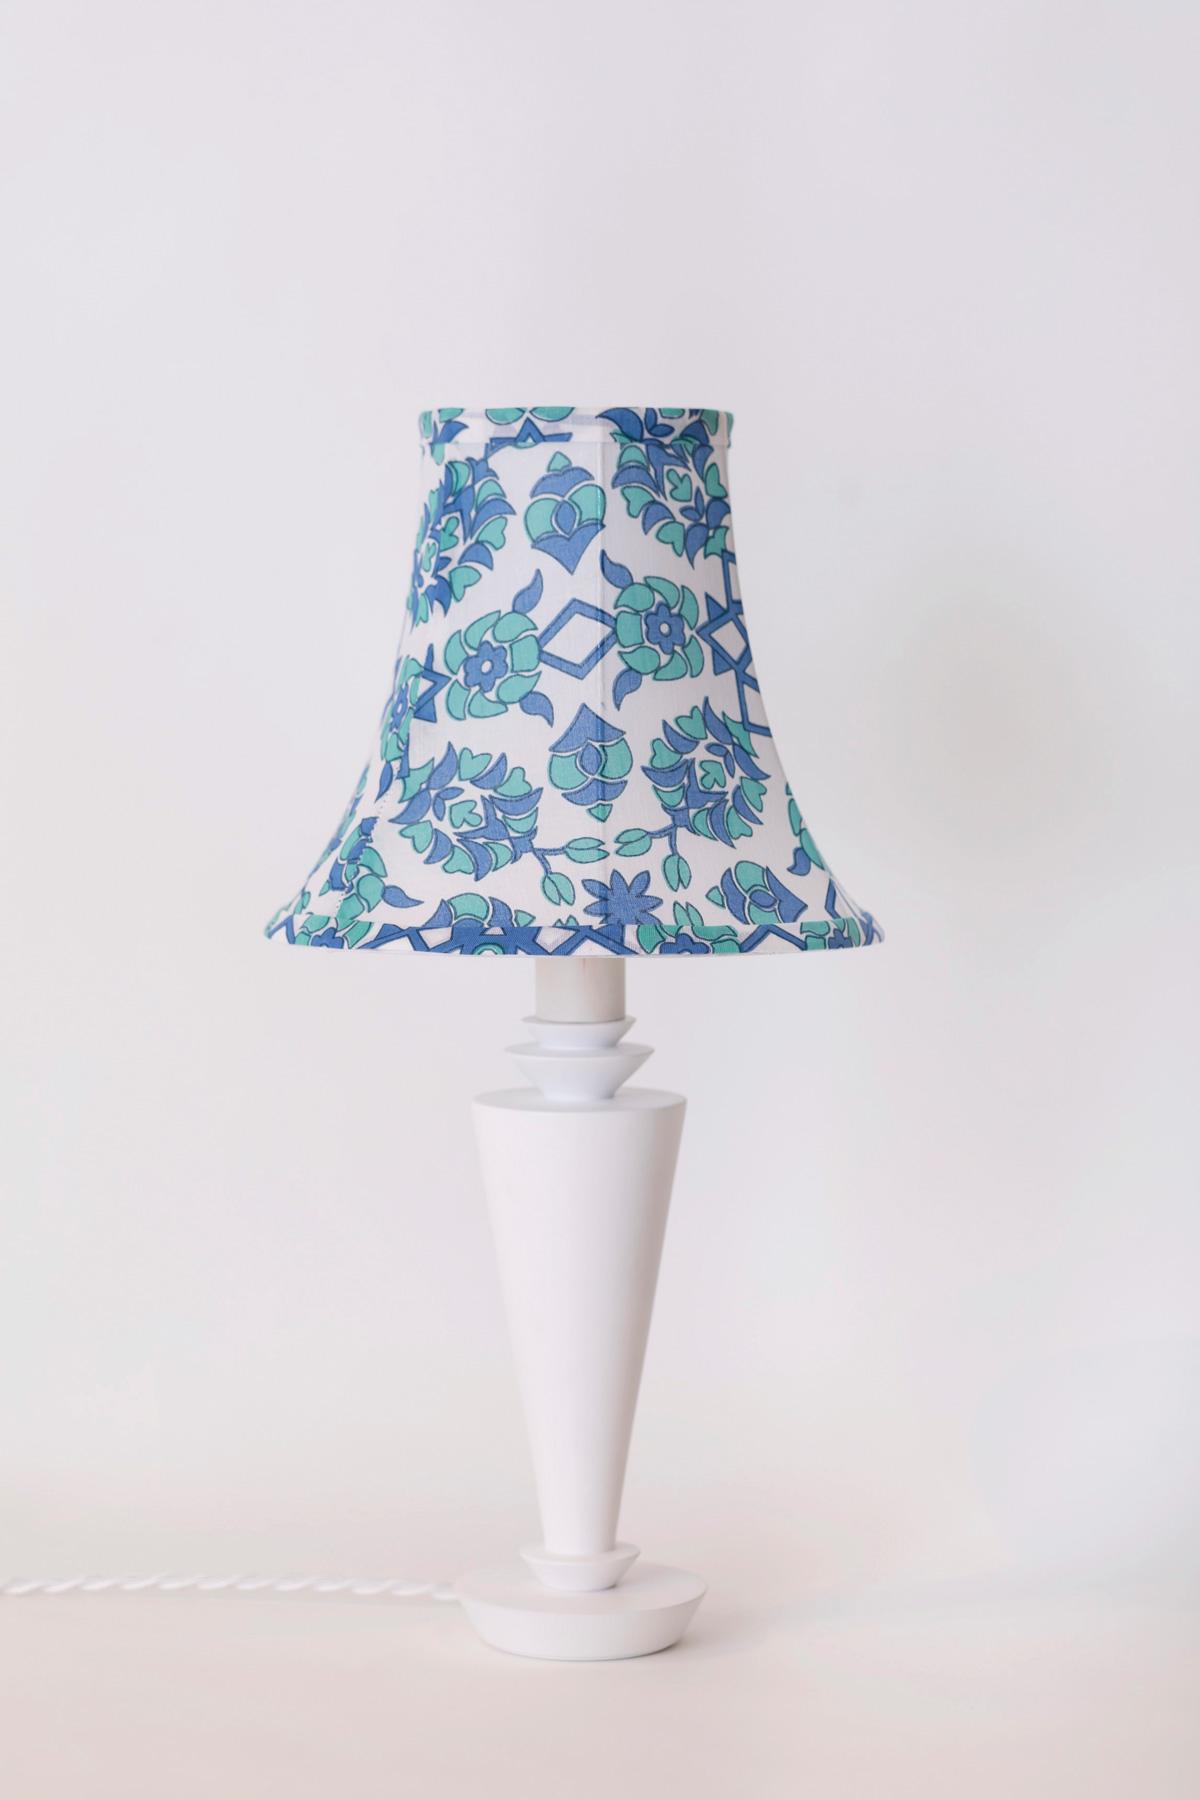 warp-tablelampのイメージ